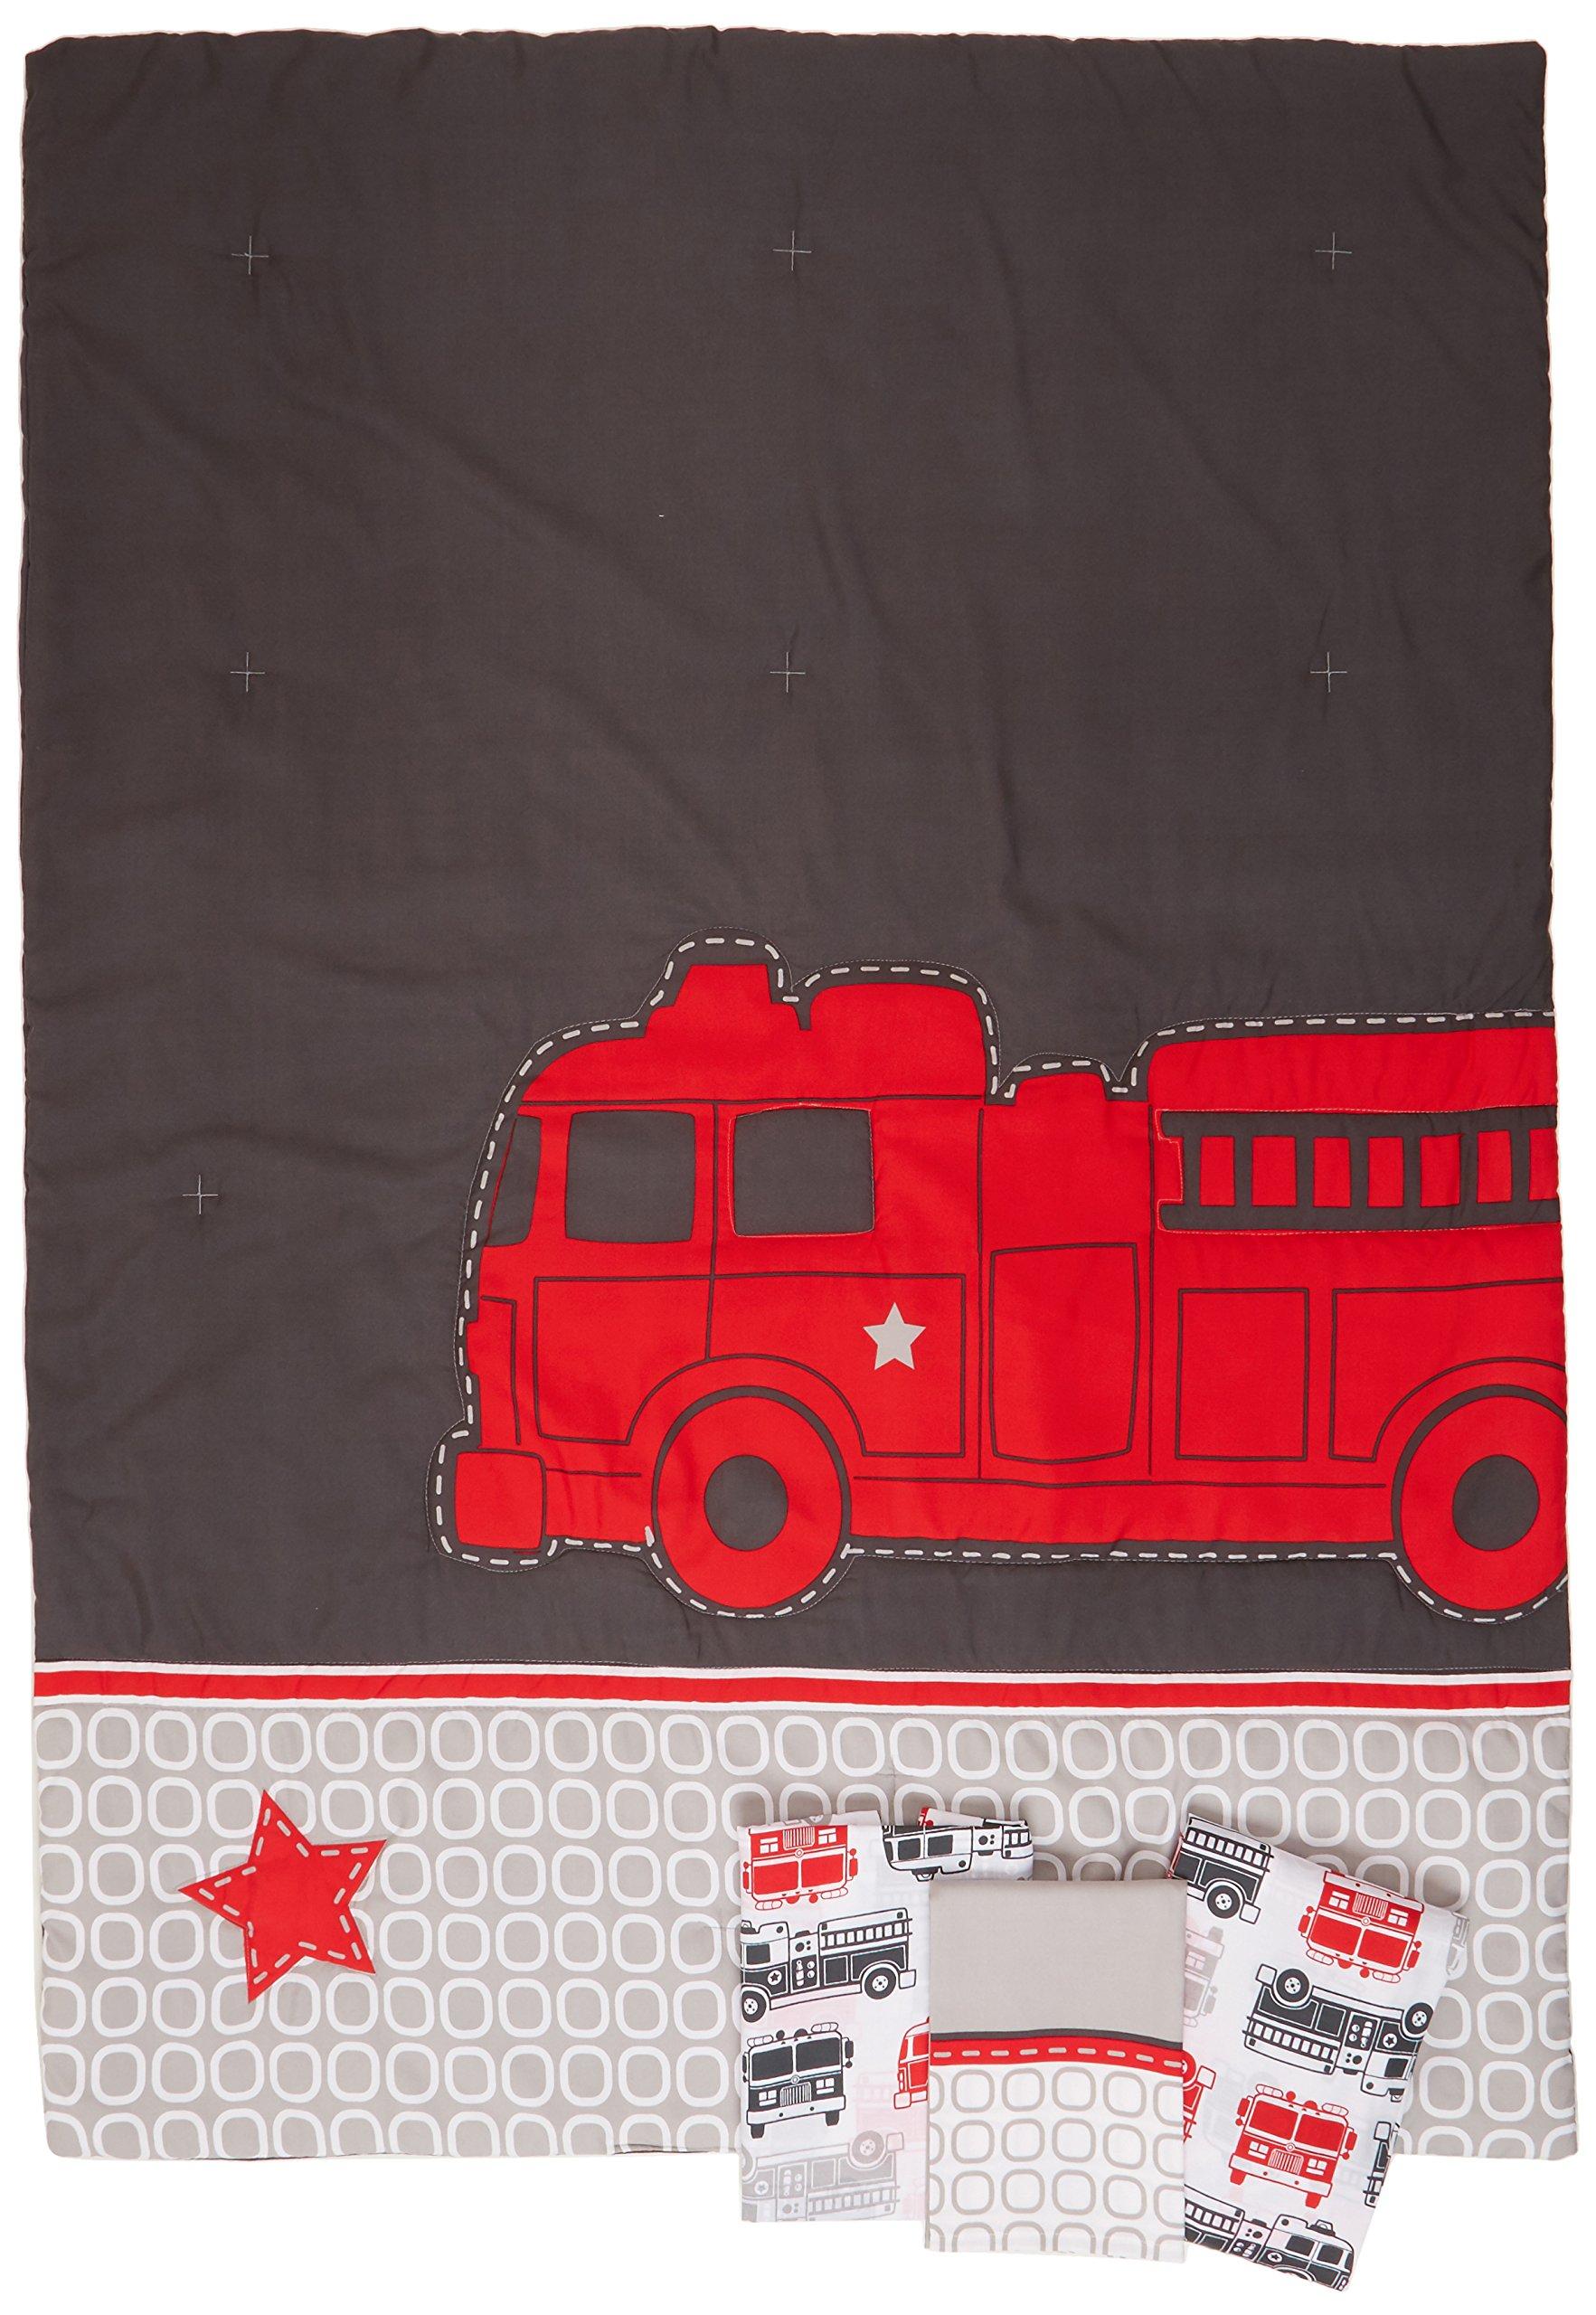 Carter's 4 Piece Toddler Bed Set, Fire Truck by Carter's